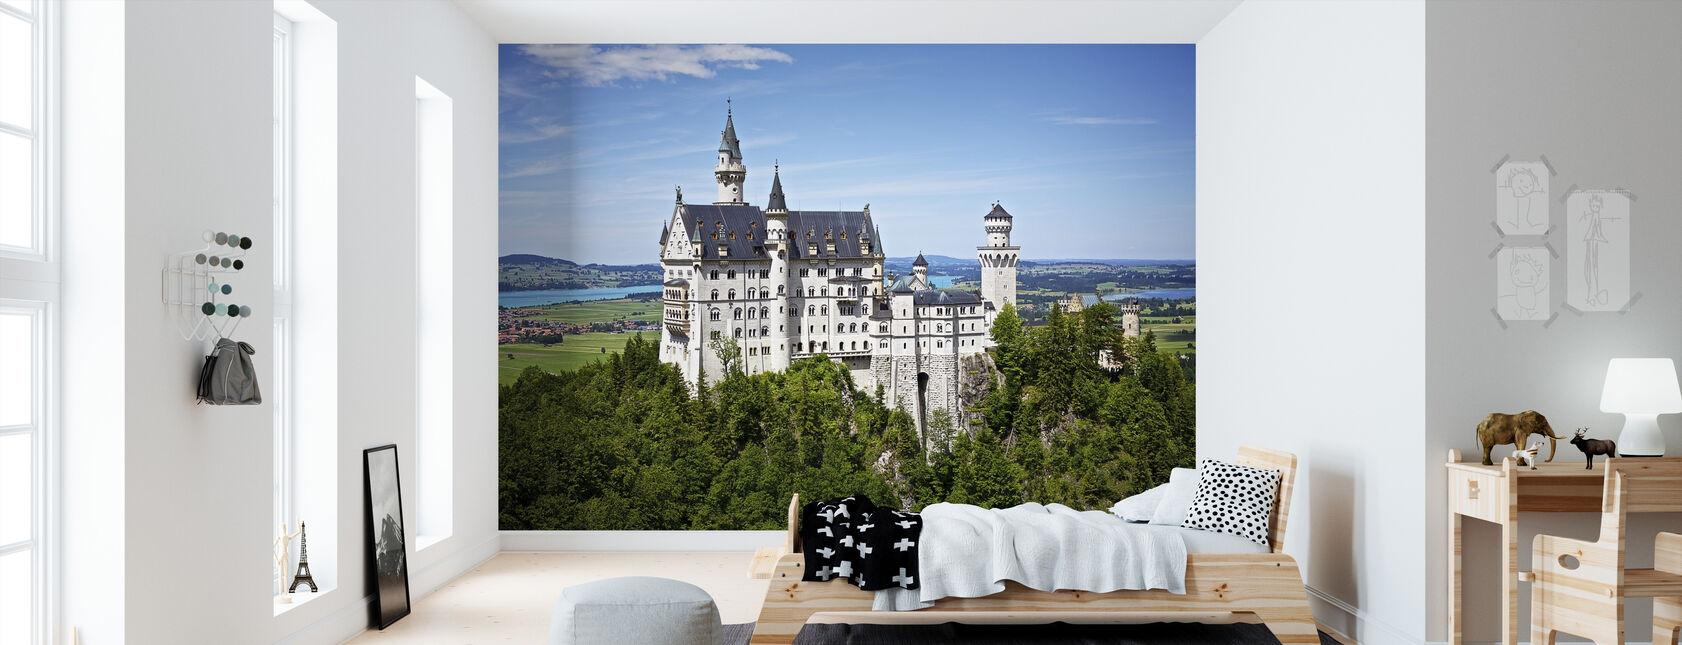 Neuschwanstein Disney Castle - Wallpaper - Kids Room